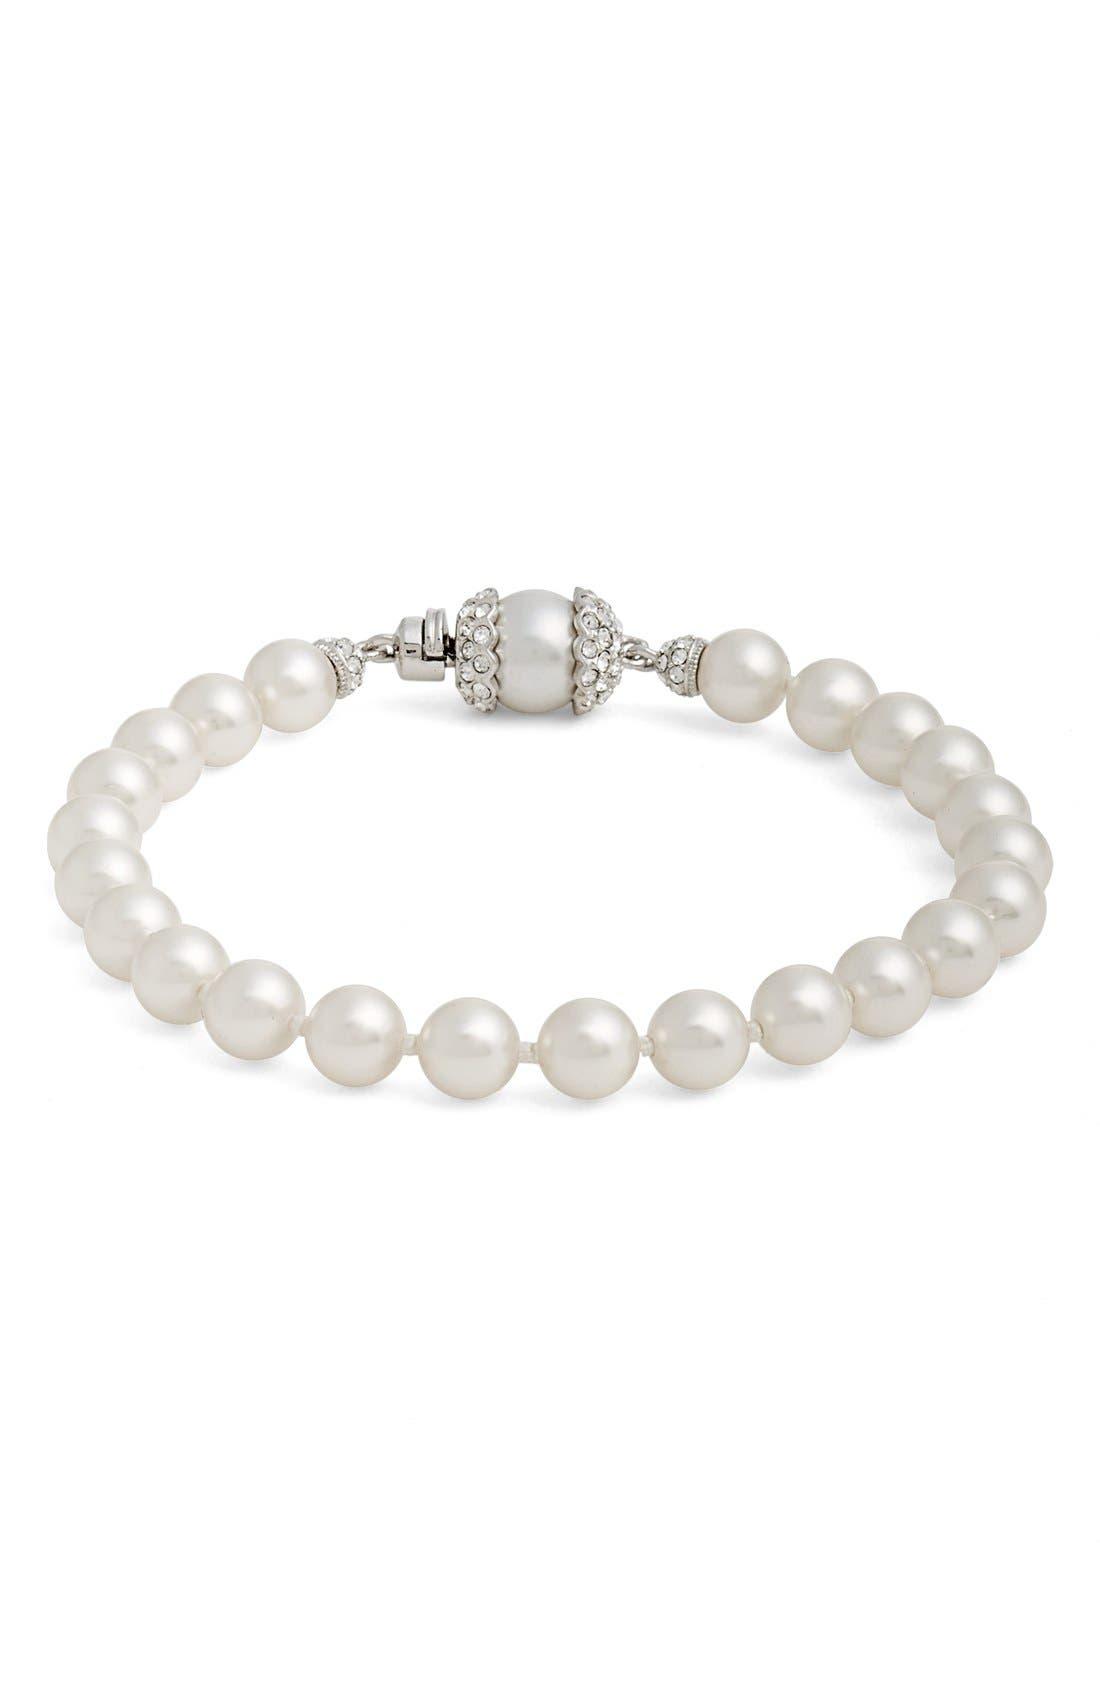 NADRI ImitationPearl Bracelet